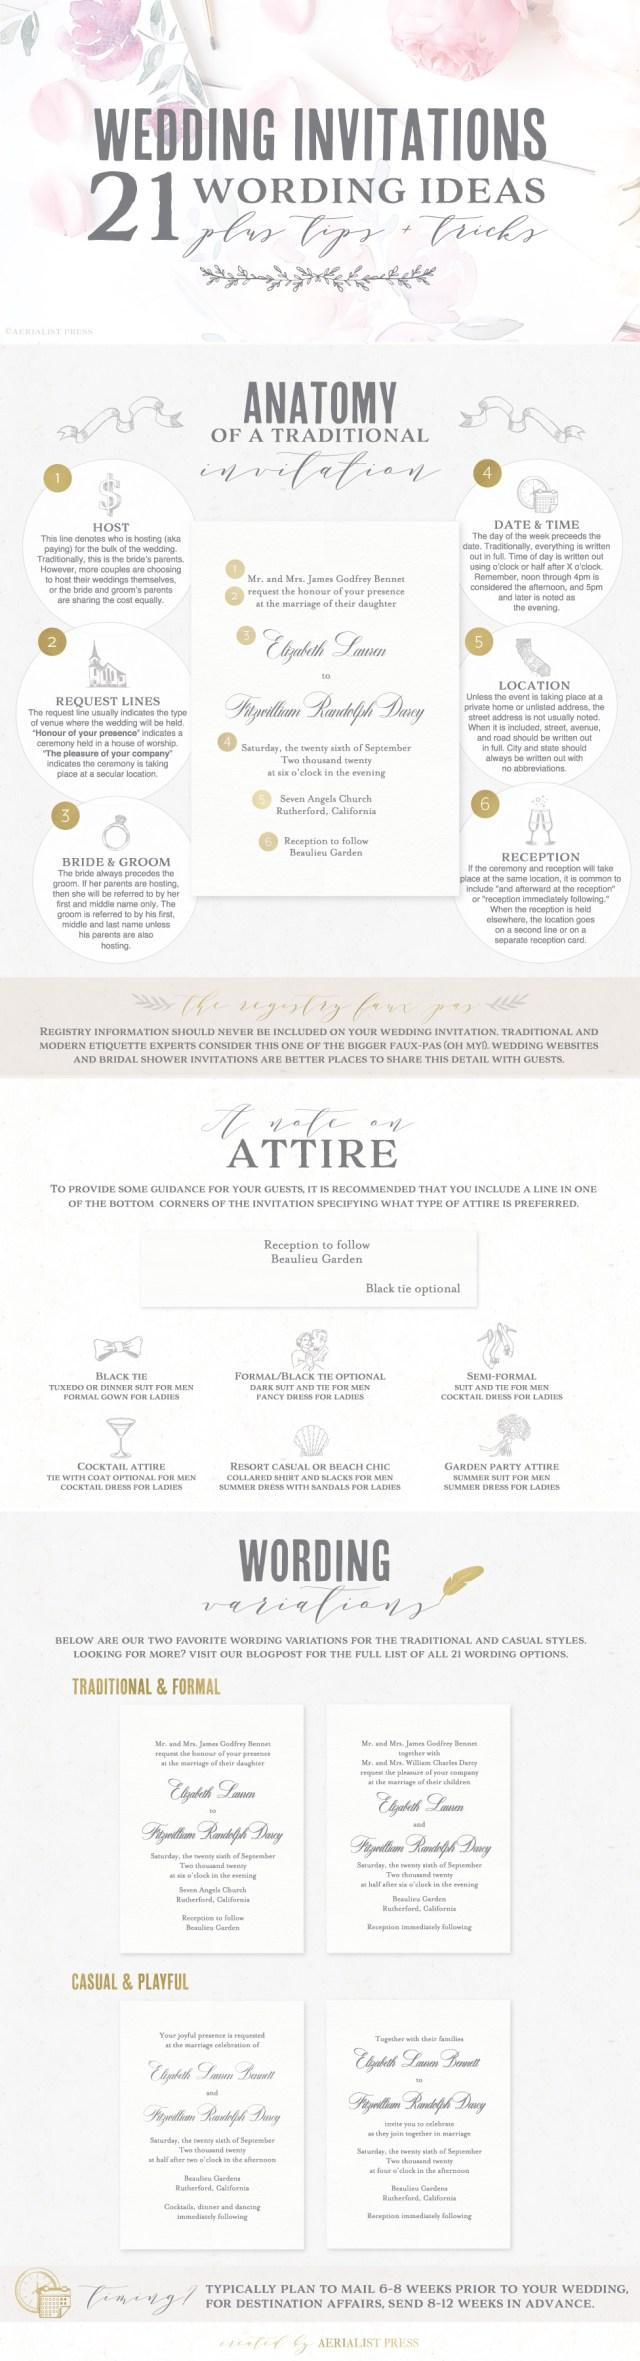 Wedding Invitations Wording Samples Christian Wedding Invitation Wording Samples From Bride And Groom